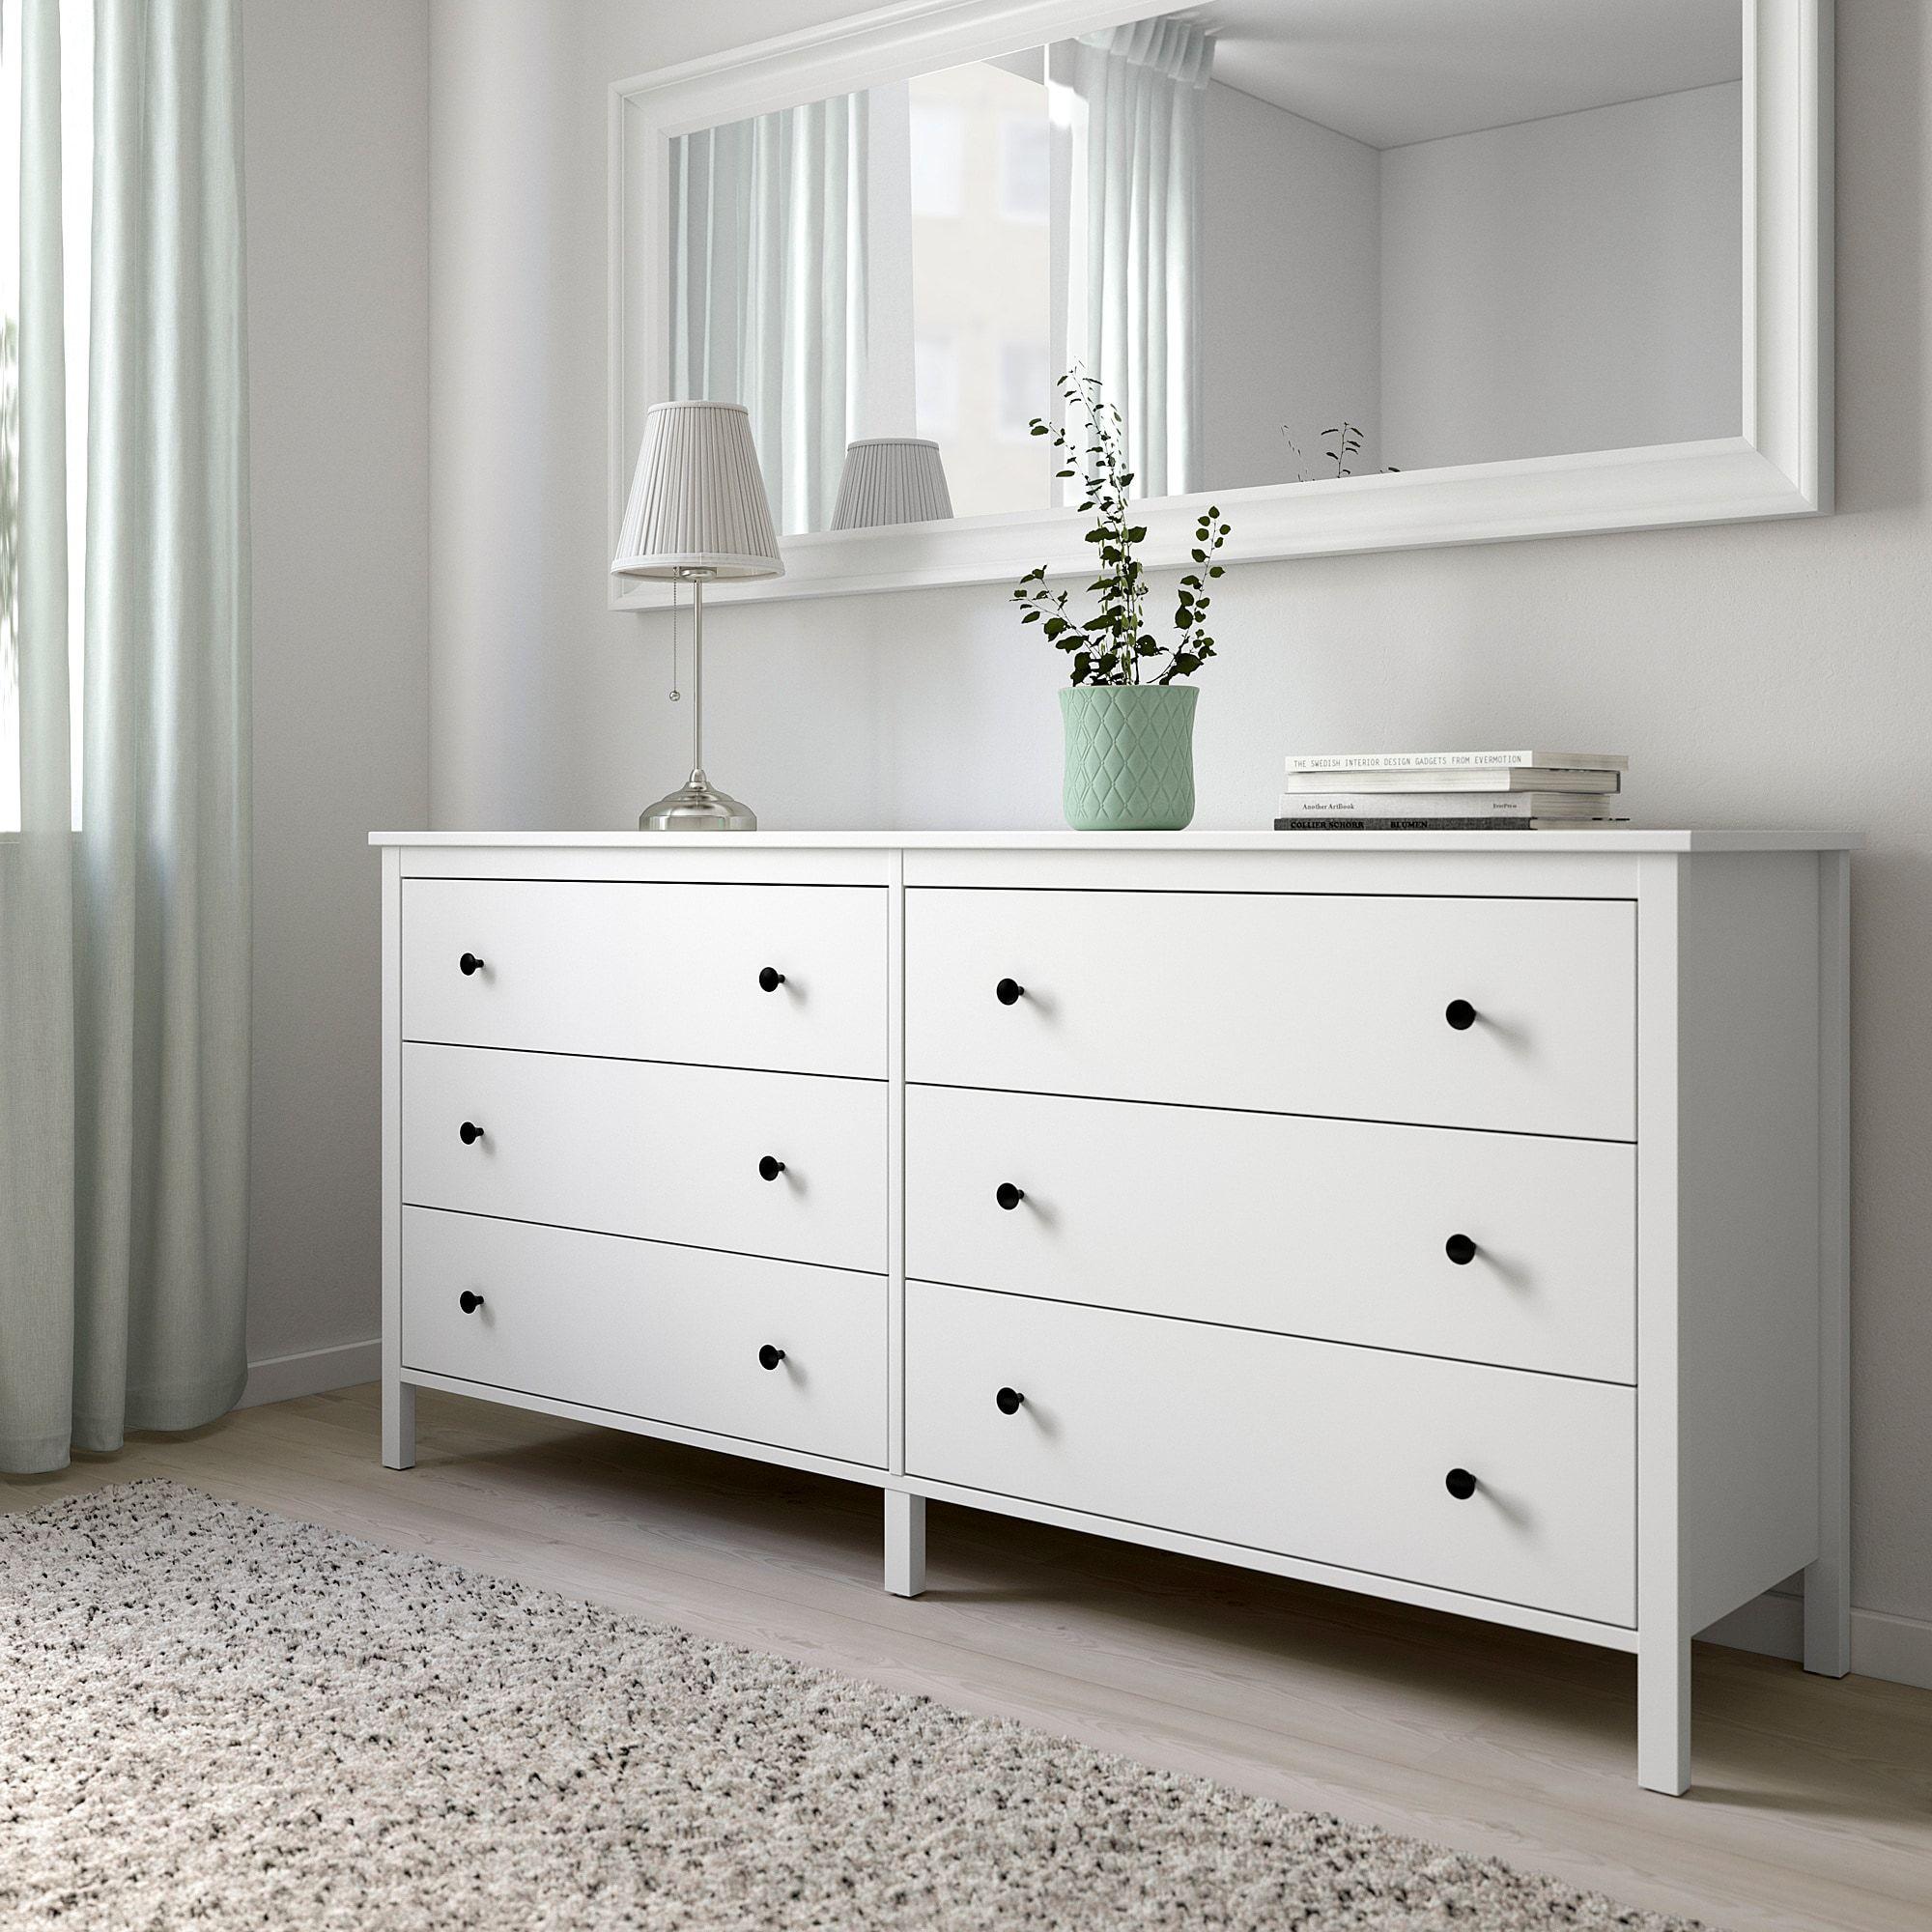 Photo of KOPPANG cassettiera con 6 cassetti – bianco – IKEA austria